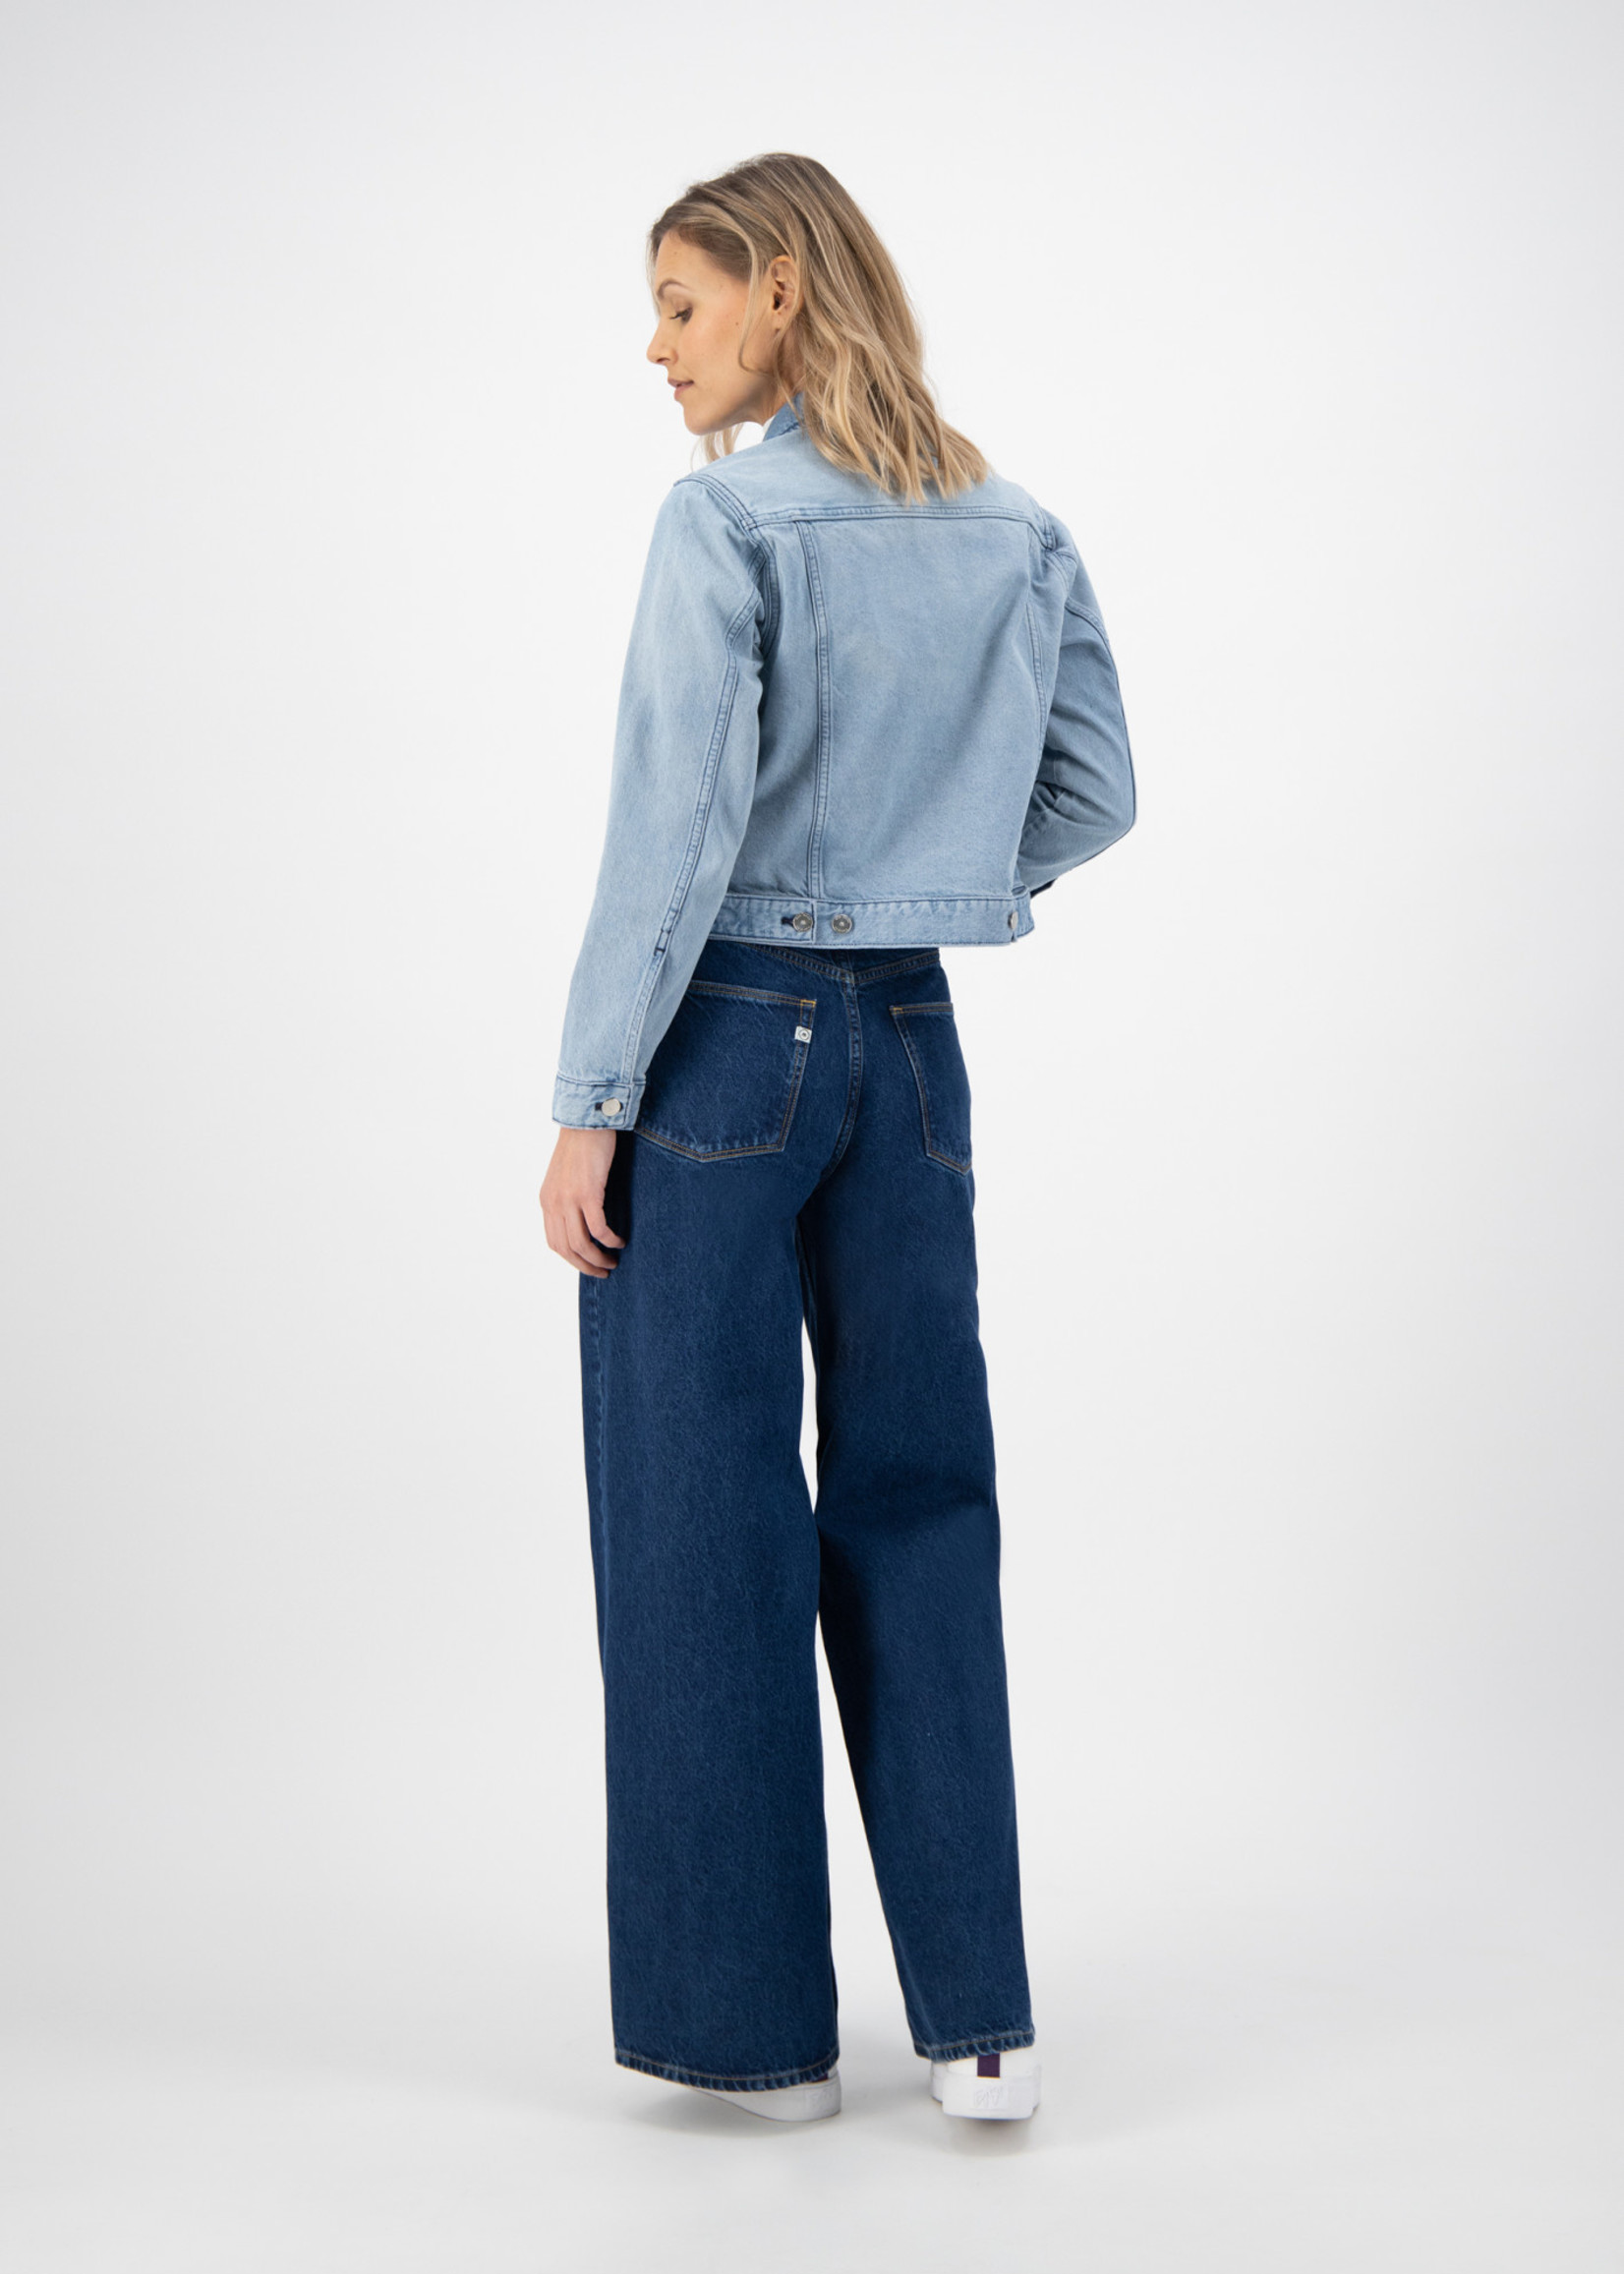 MUD Jeans MUD Jeans - Troy Jacket - Summer Stone